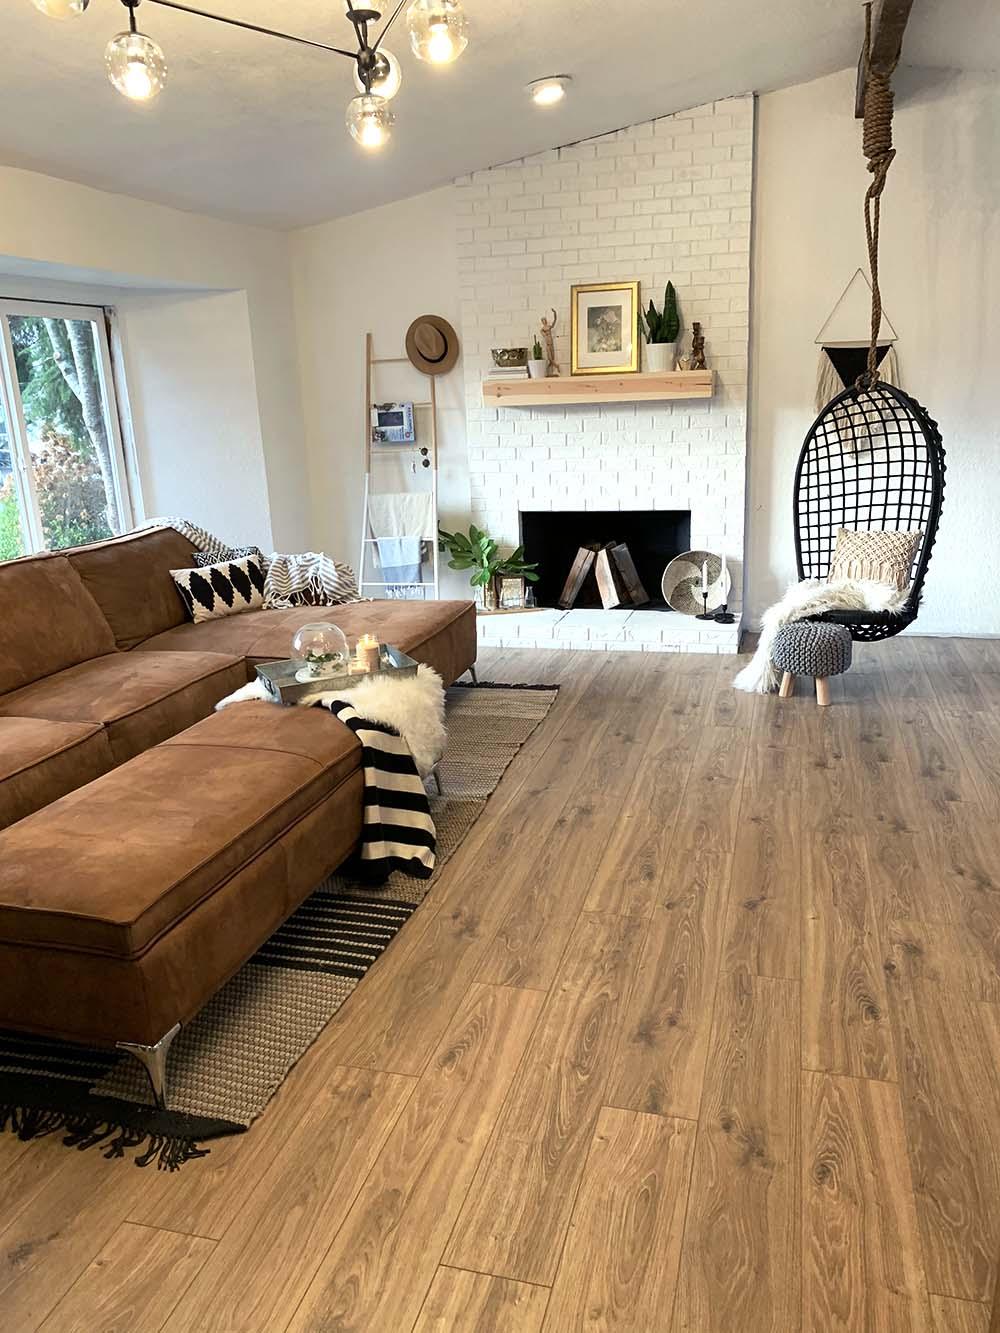 9 Tips For Installing Aquaguard, Who Makes Aquaguard Laminate Flooring